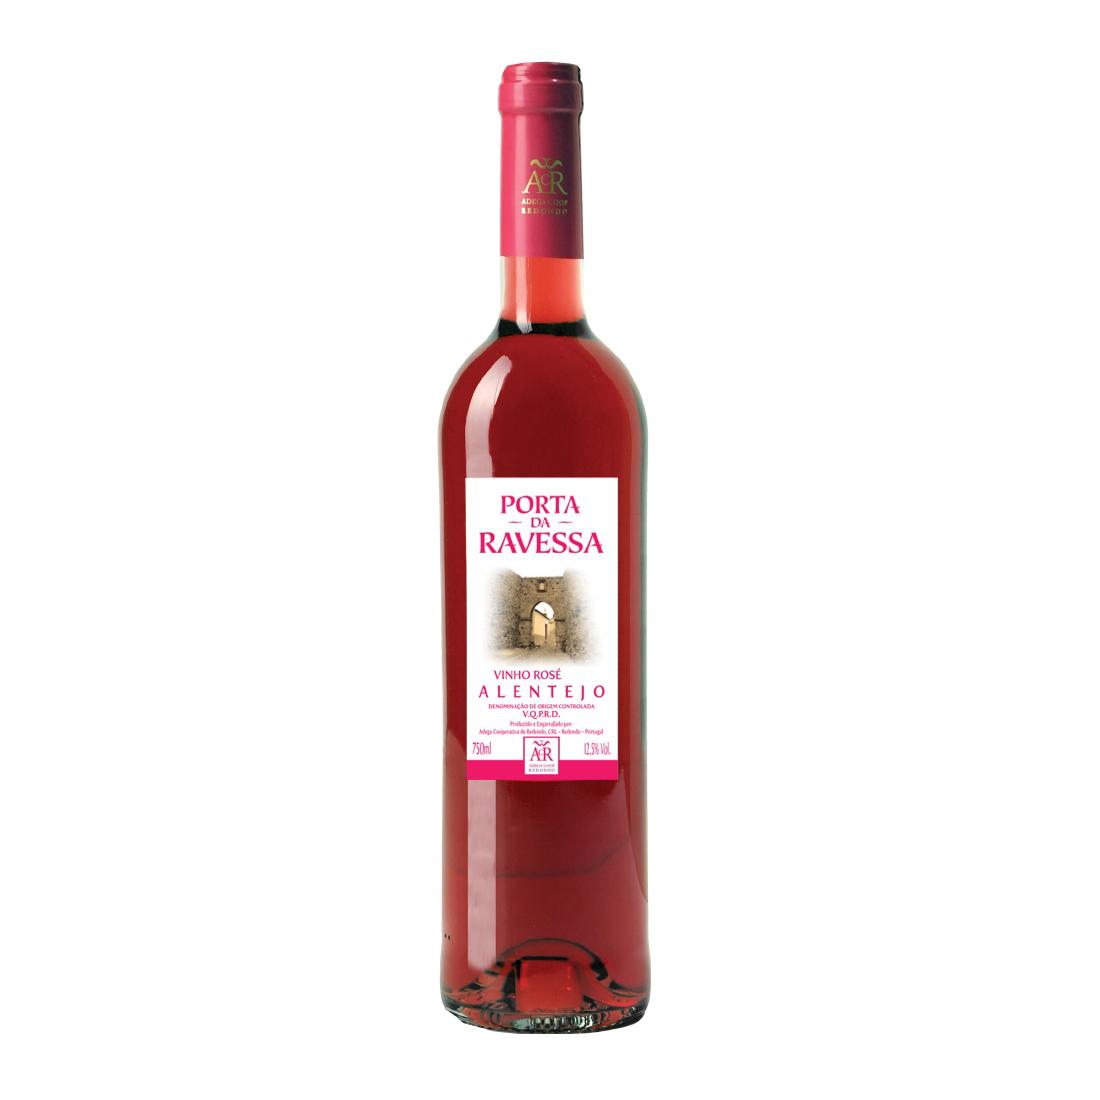 Vinho Porta da Ravessa Rosé 750 ml